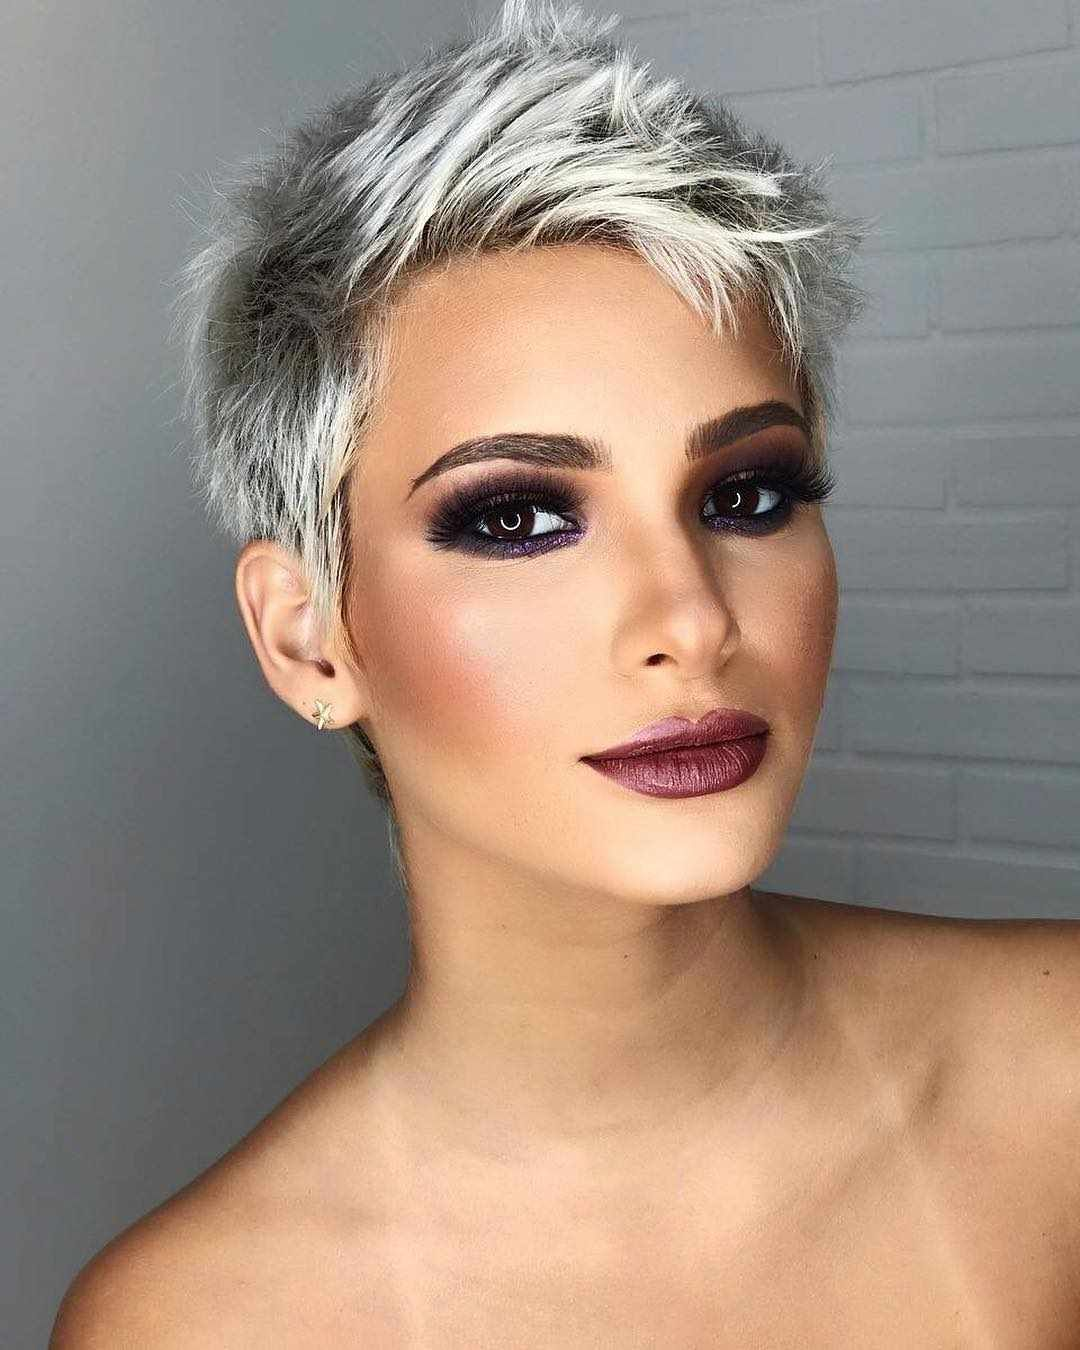 40 gorgeous short pixie cut hairstyles 2019 | short